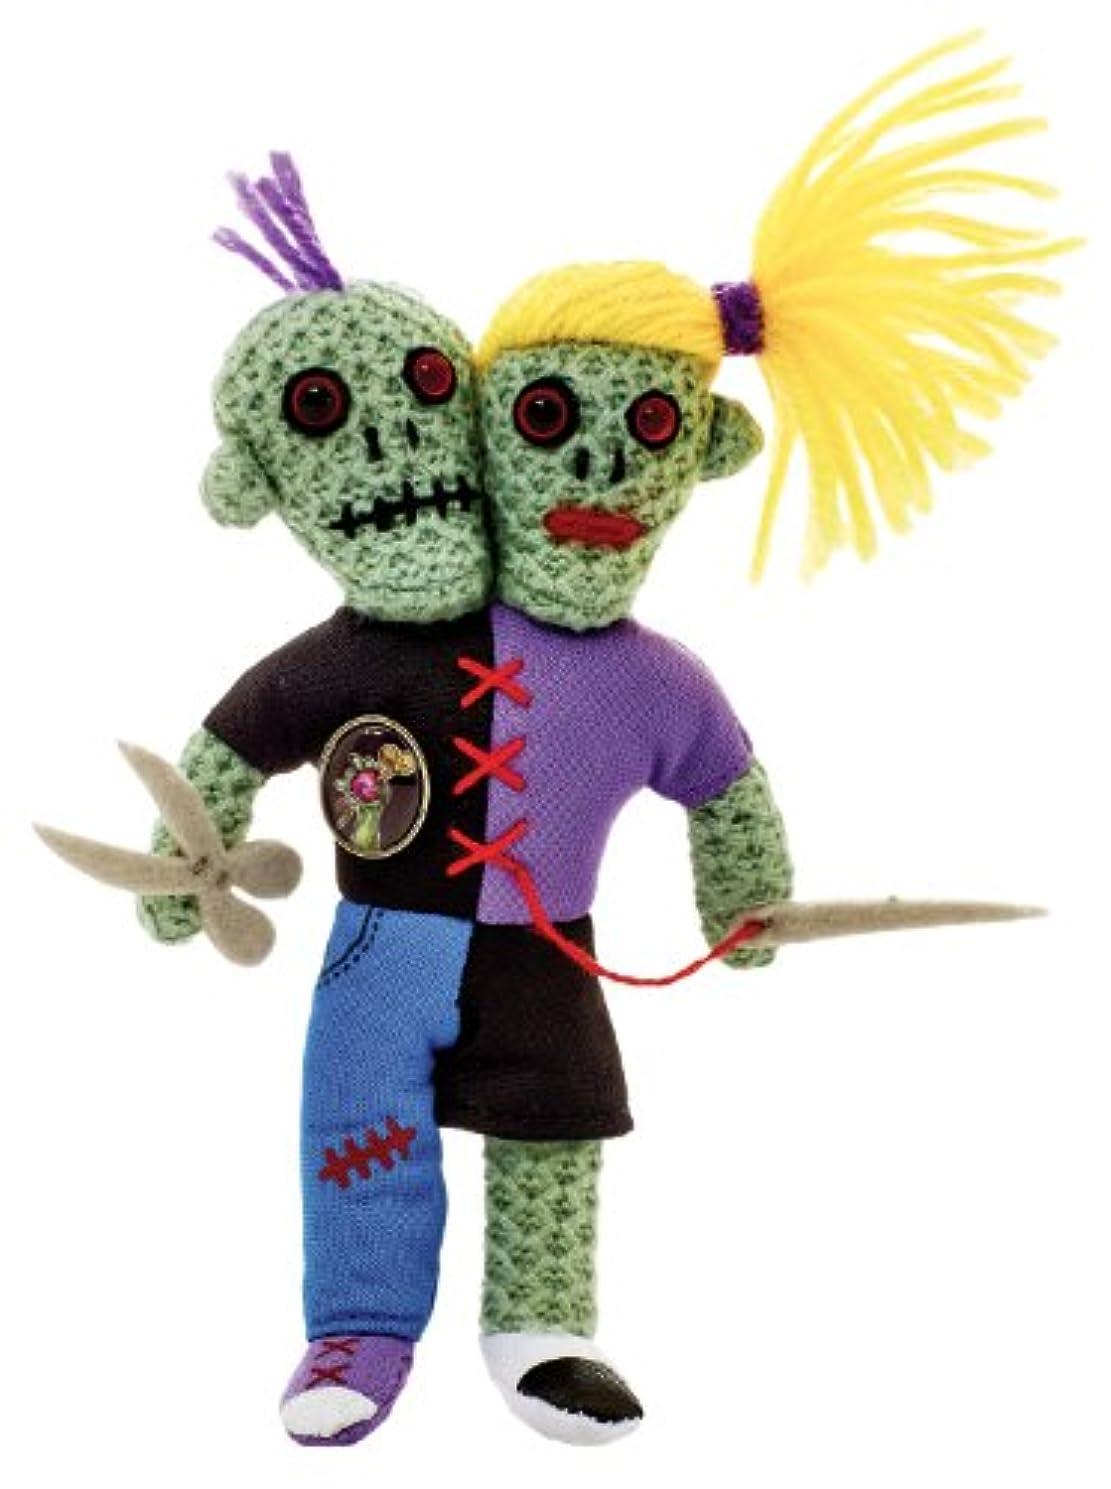 Kids Preferred Yarn Zombies Couple Brad & Angie The True Love Juju